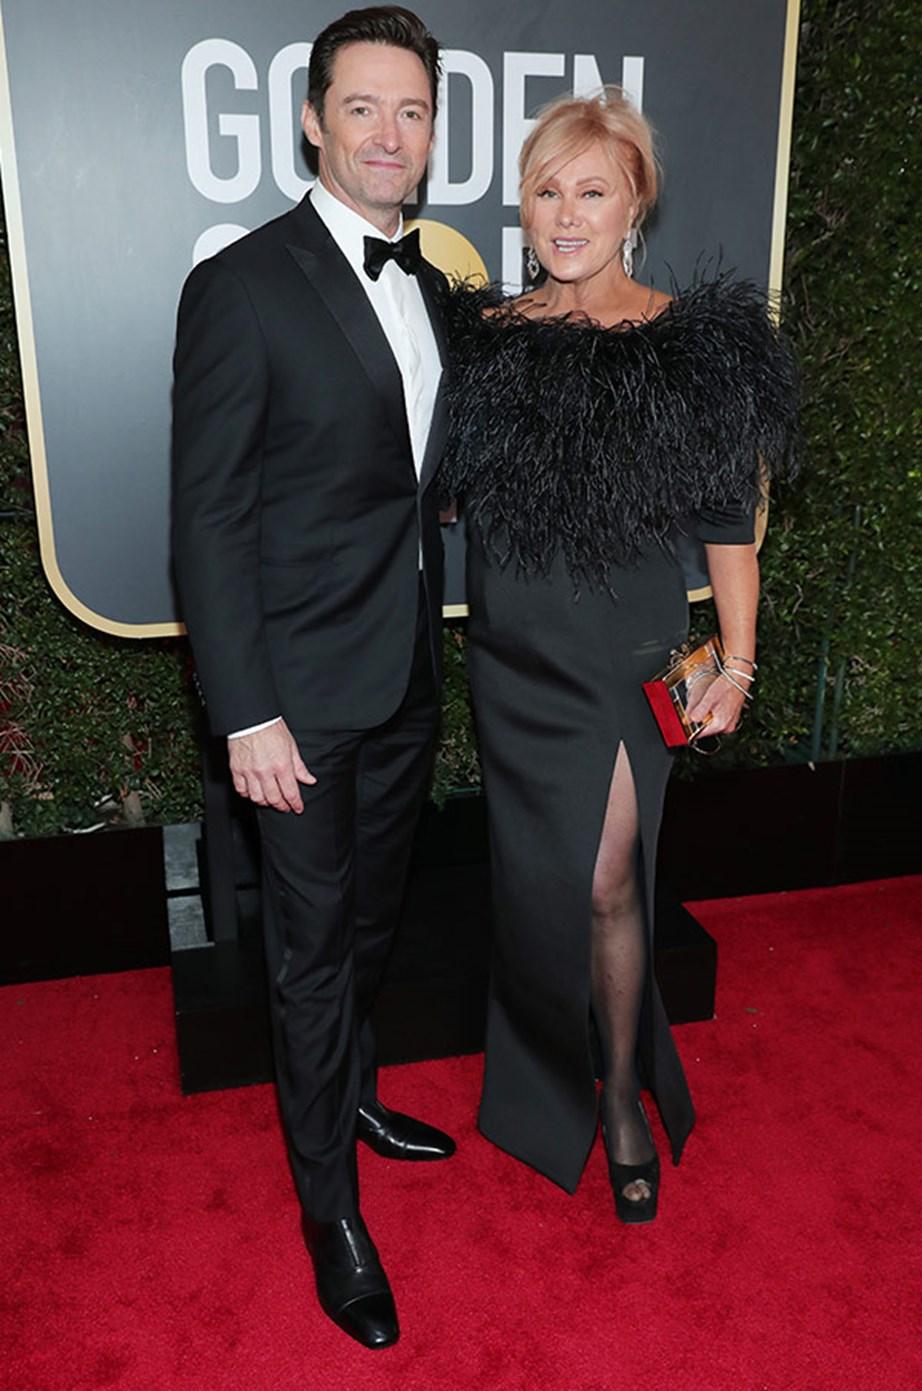 Hugh Jackman and Deborra Lee Furness couldn't look more in love!